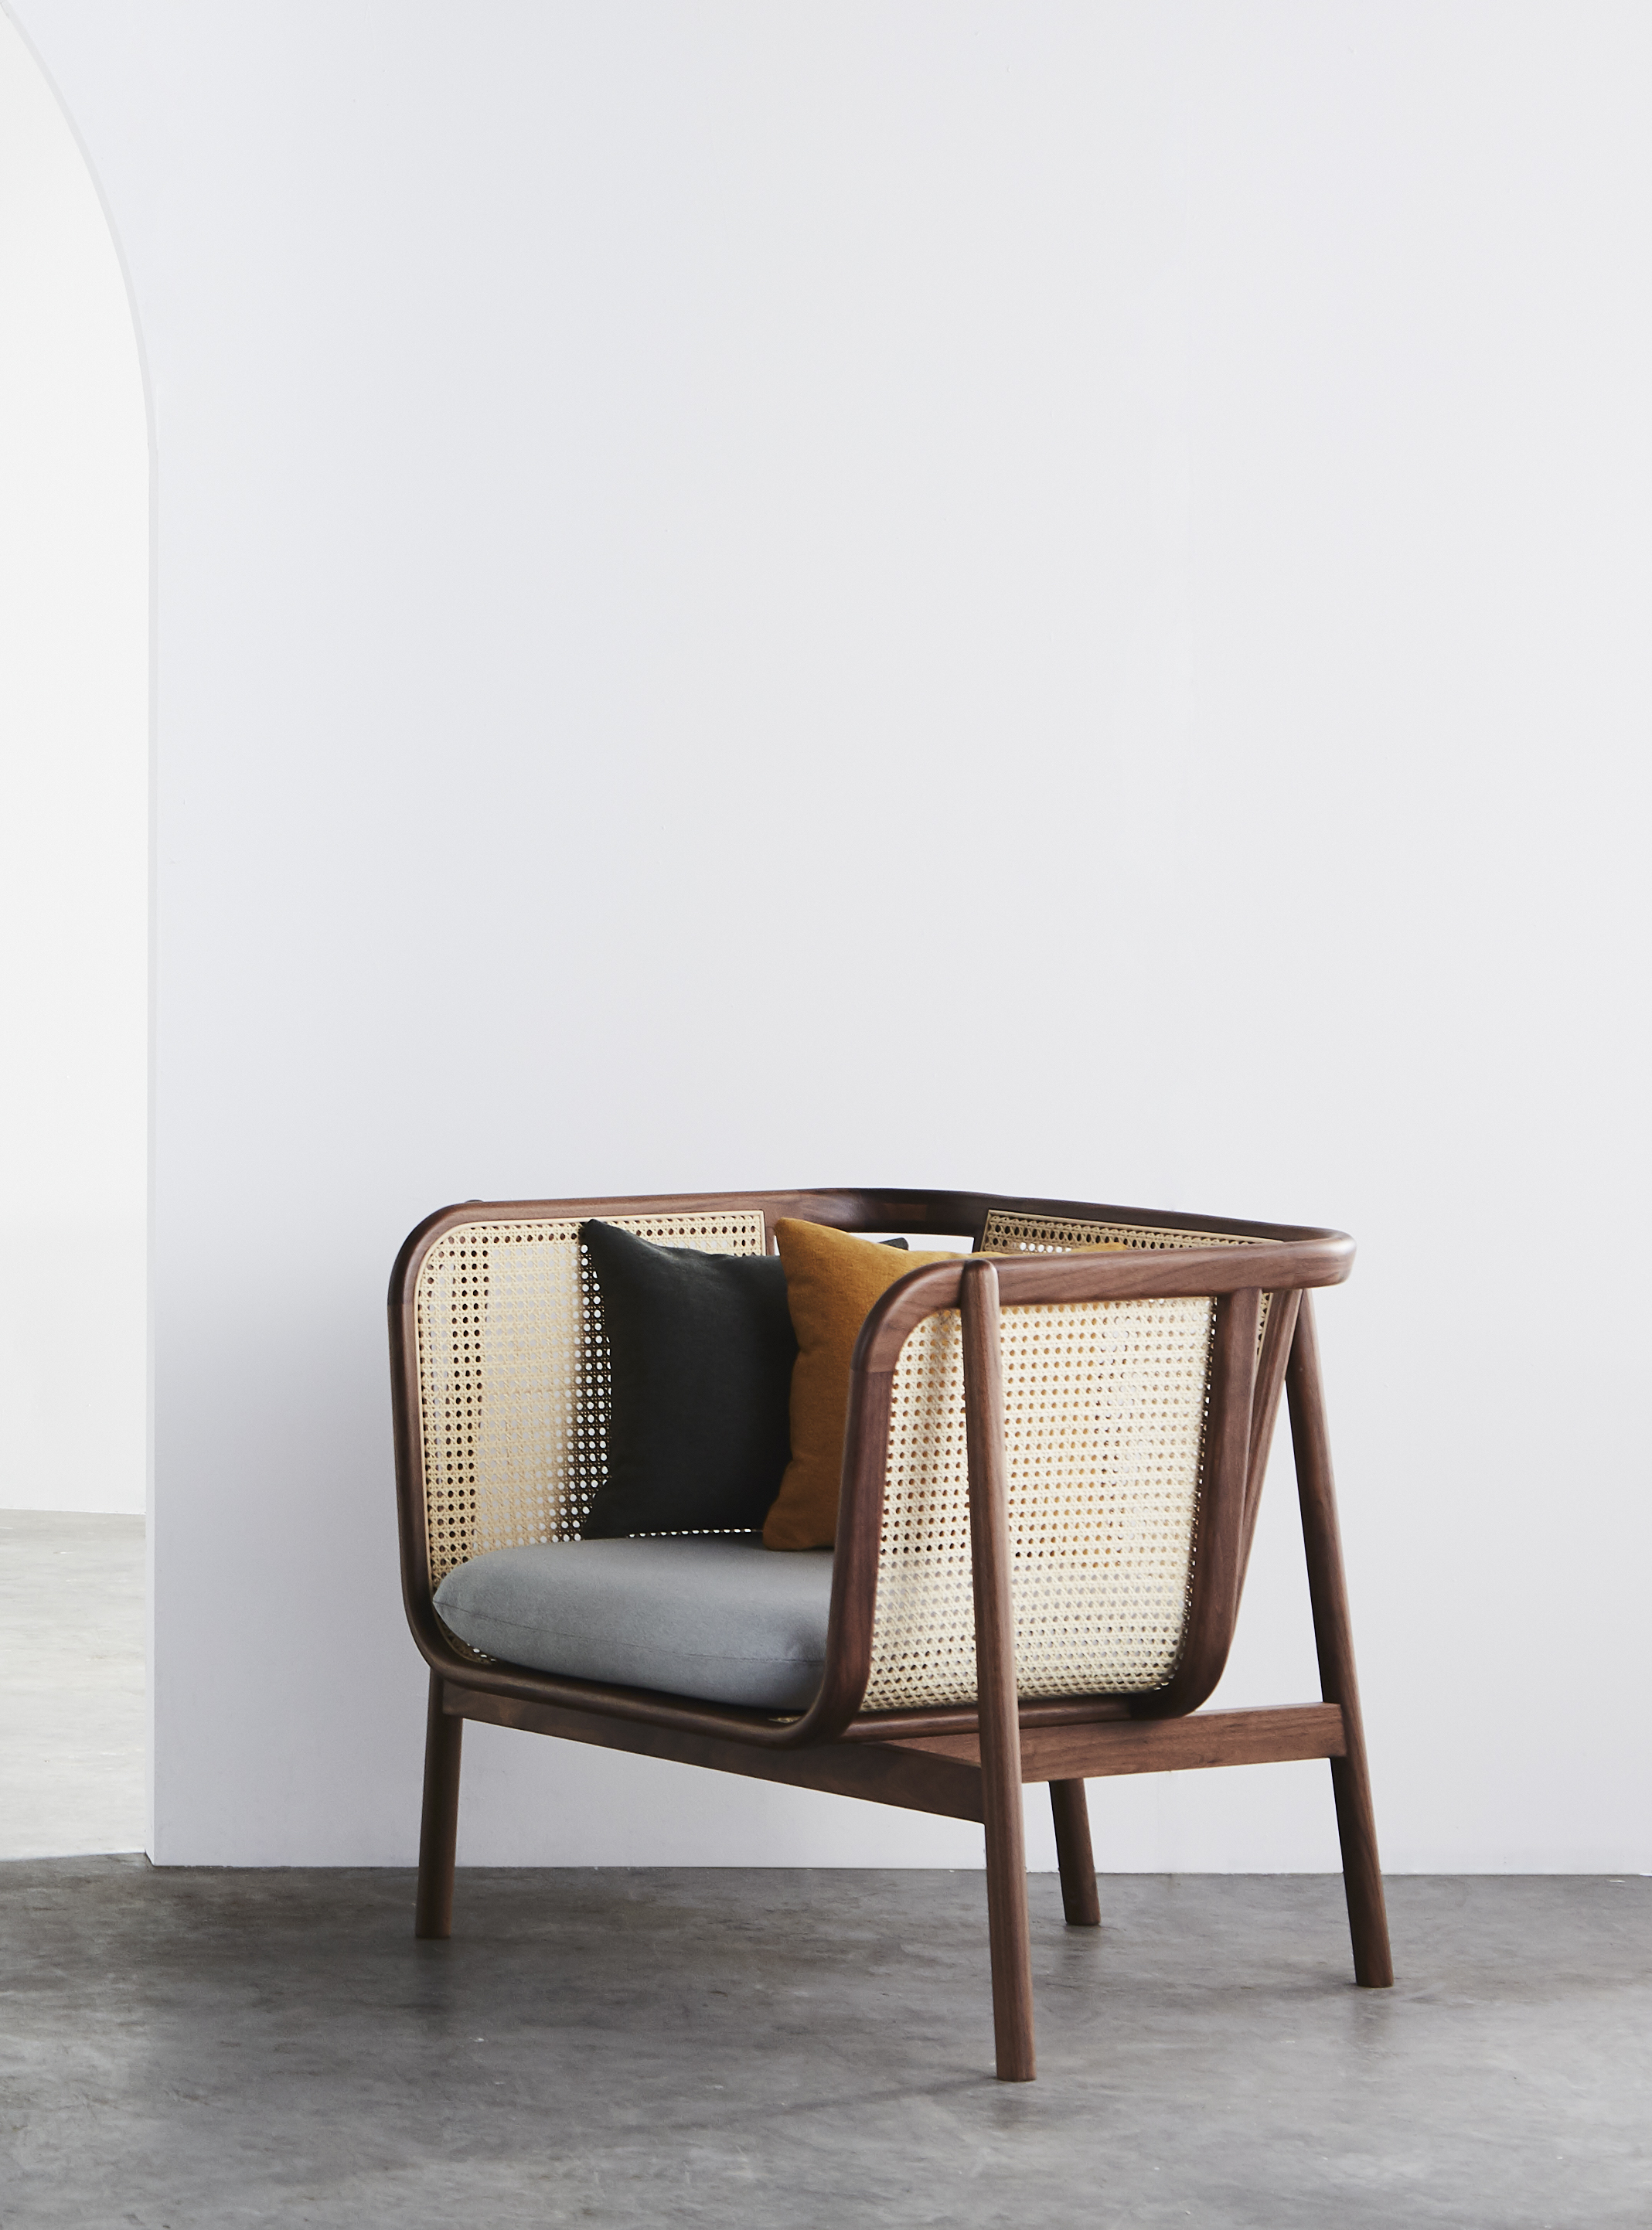 Cane Sofa - 02 (One Seat)